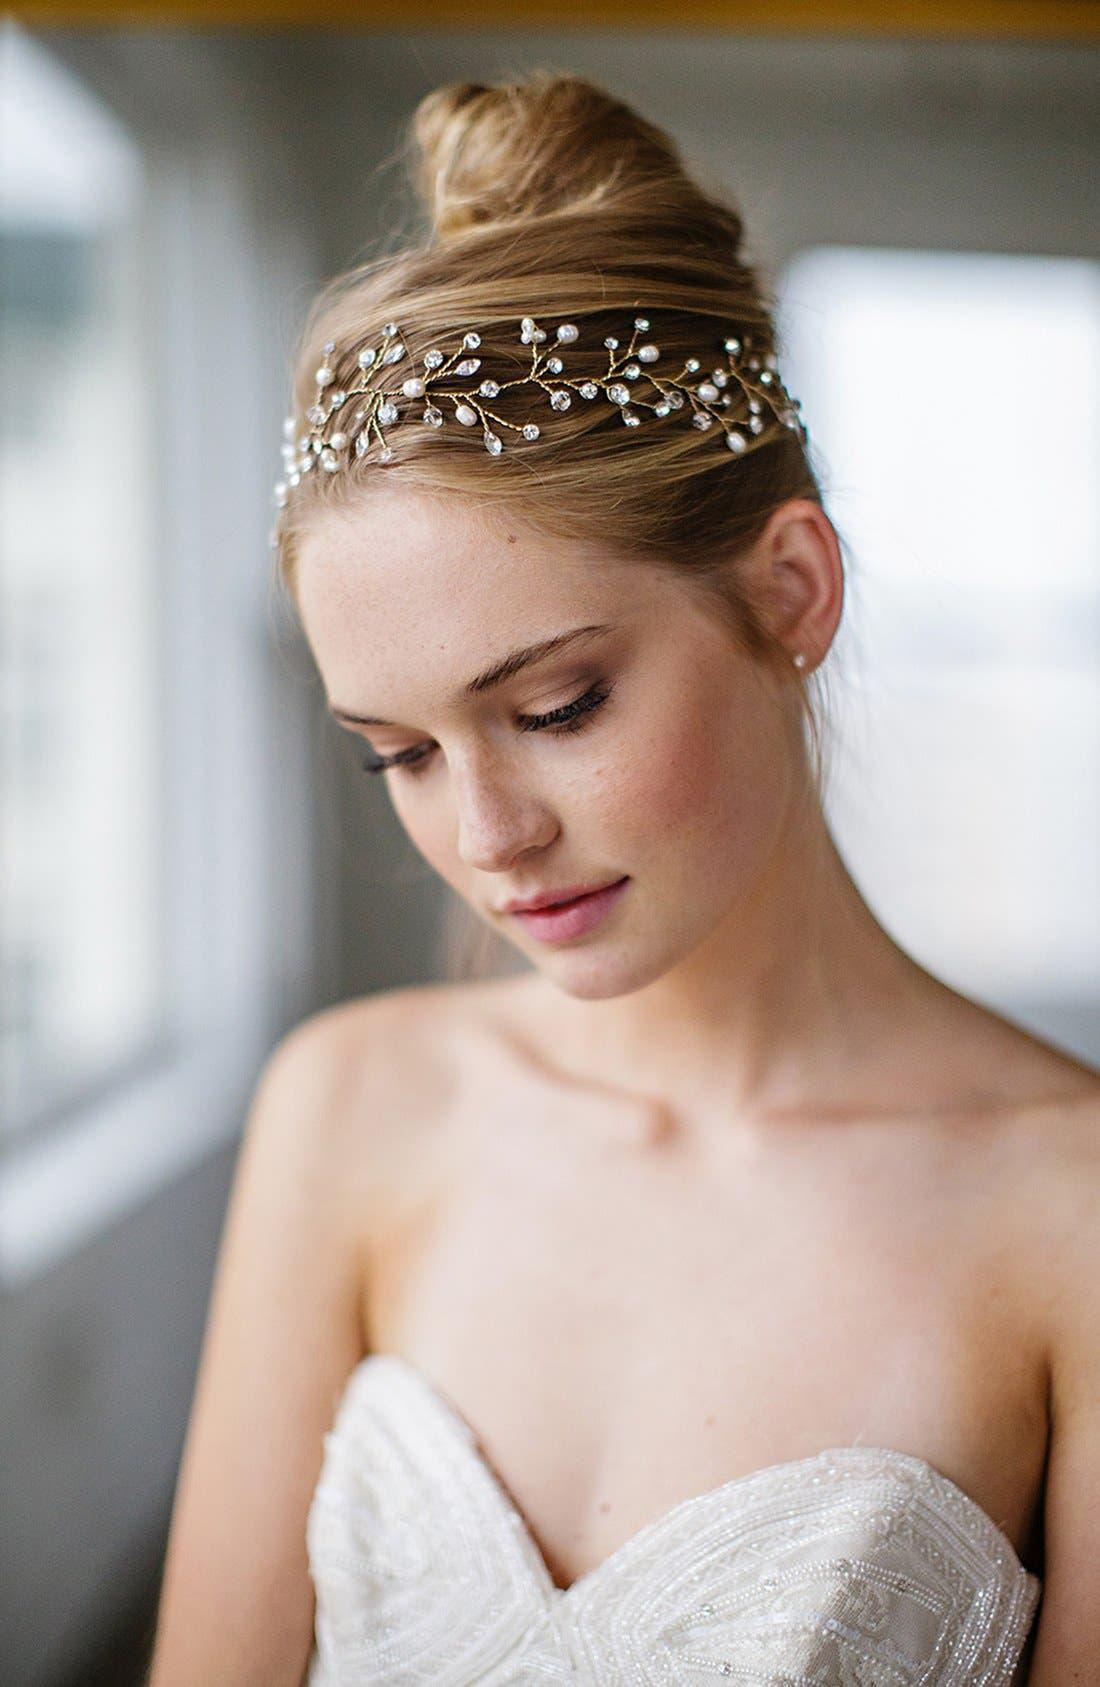 Main Image - Brides & Hairpins 'Vitalia' Pearl & Jeweled Head Band